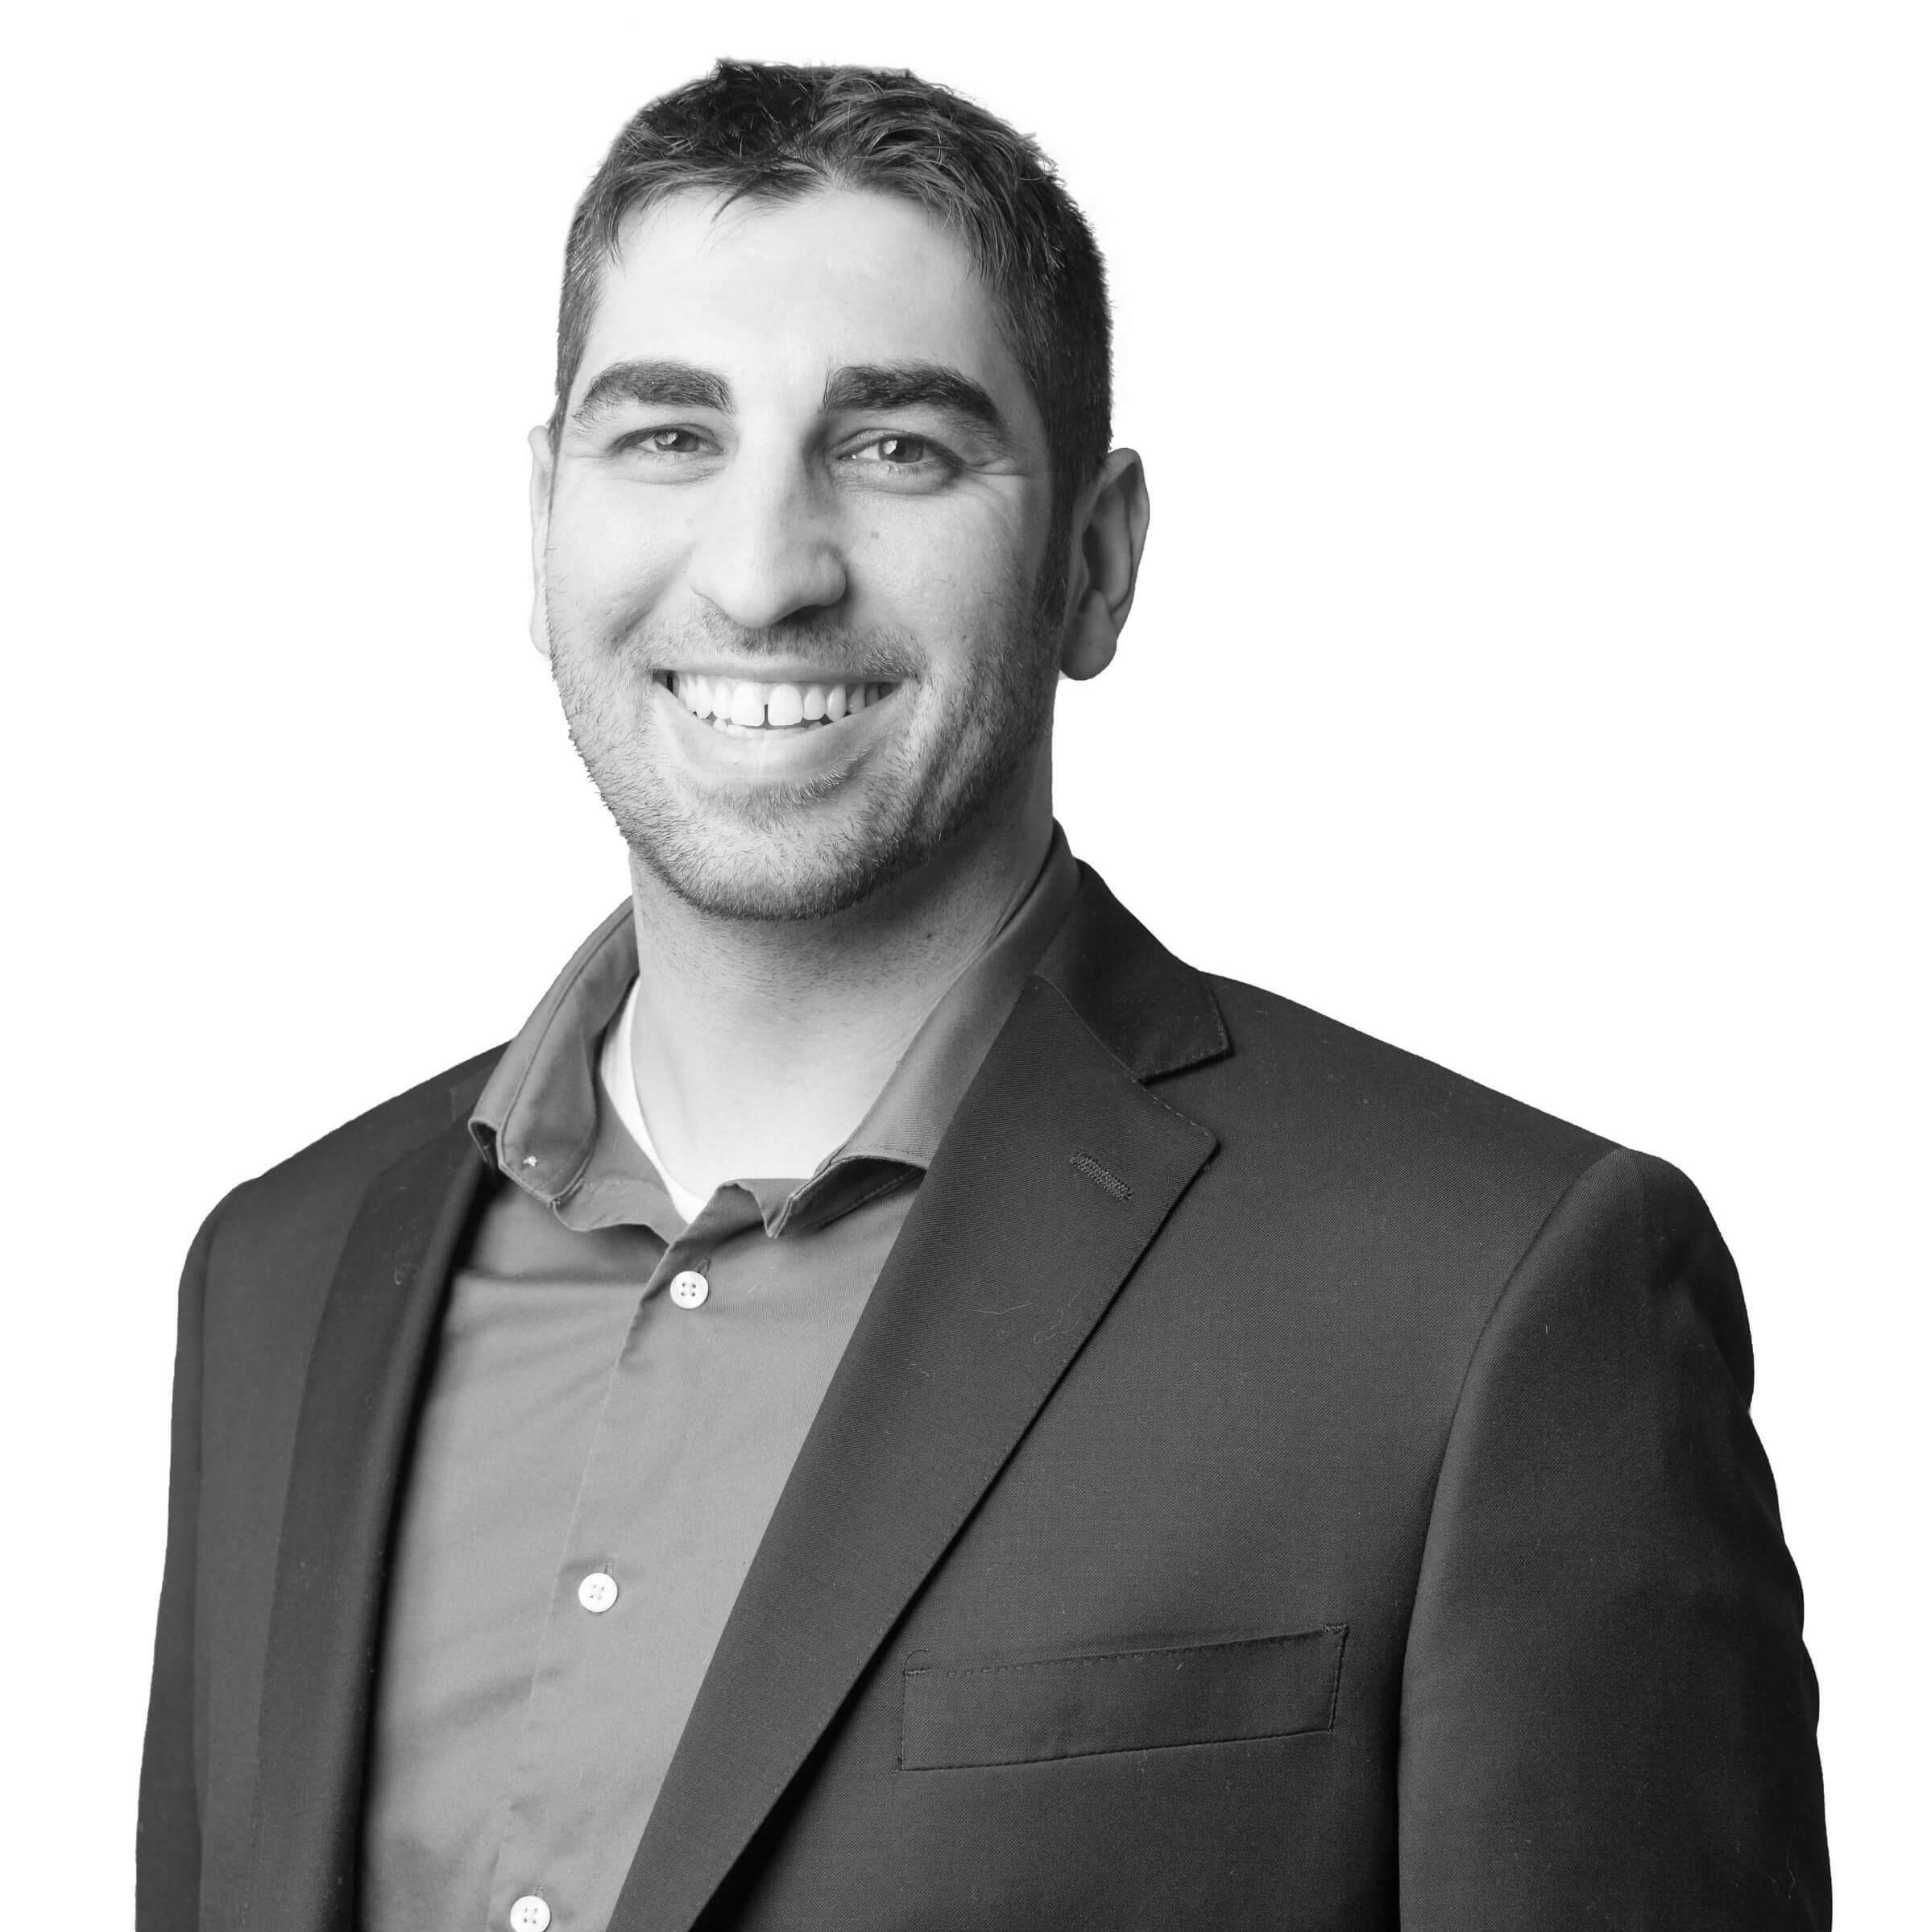 Ramin Mahmoudian, AIA